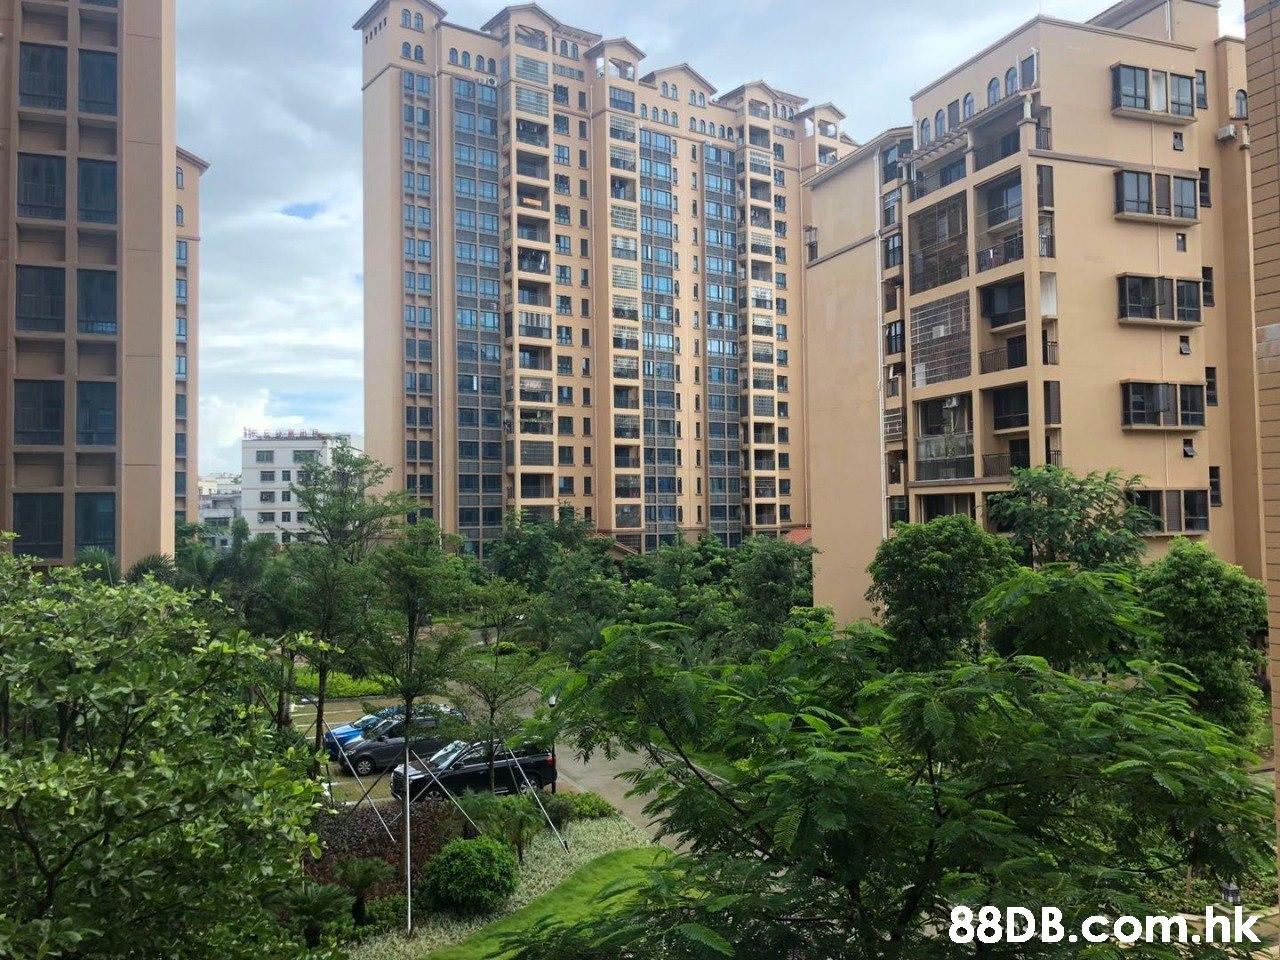 .hk  Metropolitan area,Condominium,Residential area,Urban area,Building